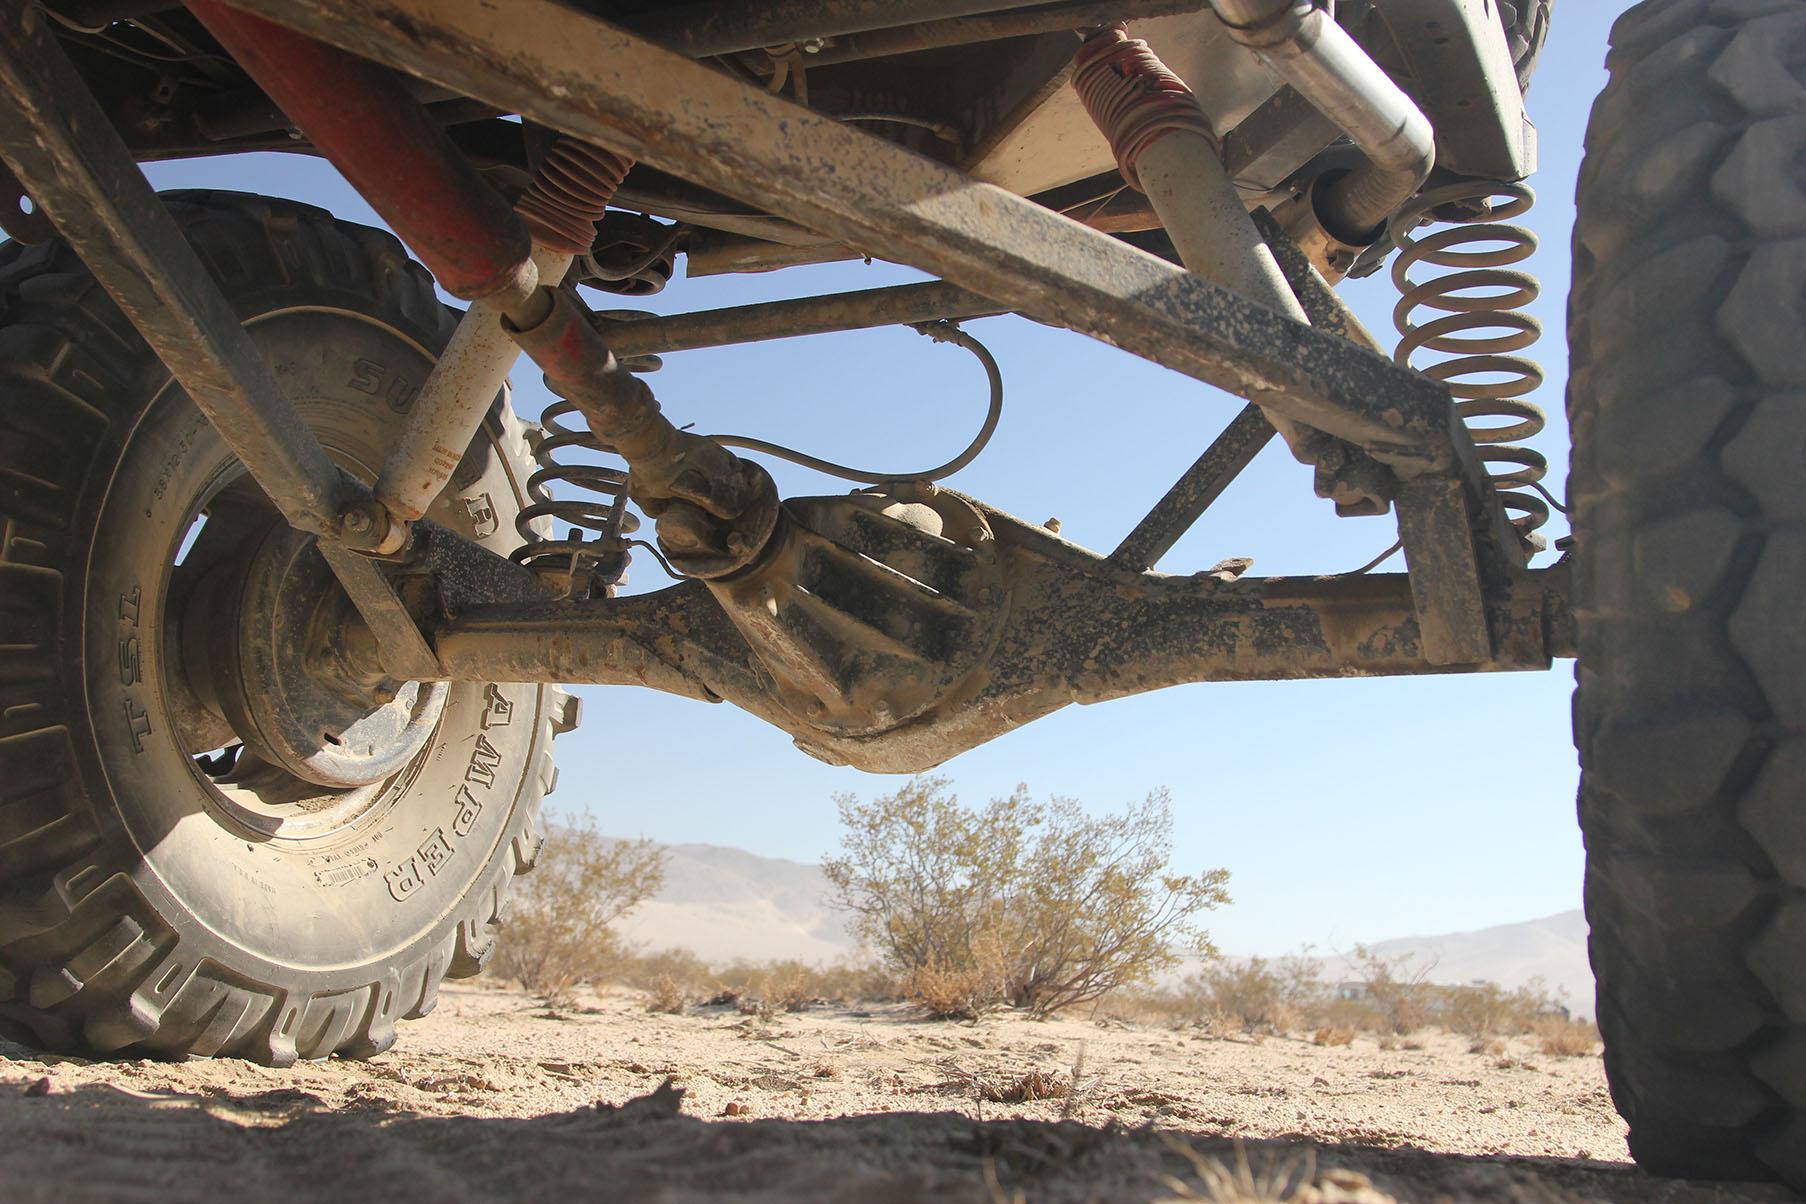 Trevor Hall's Toyota Hilux: The Crawler